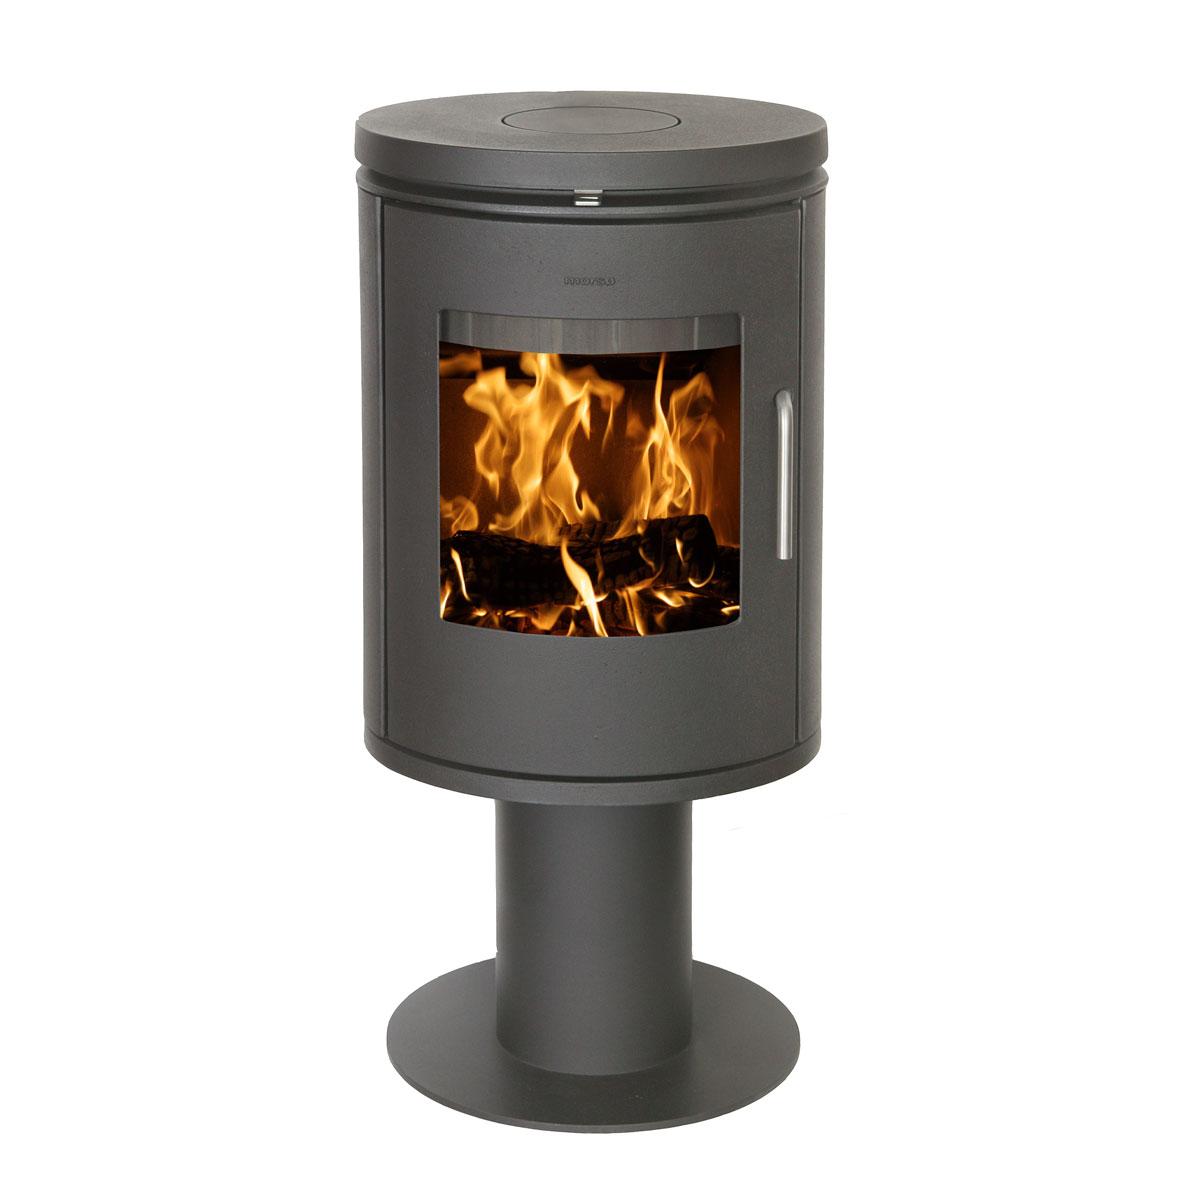 Morso 6148 freestanding wood heater with door on circular base